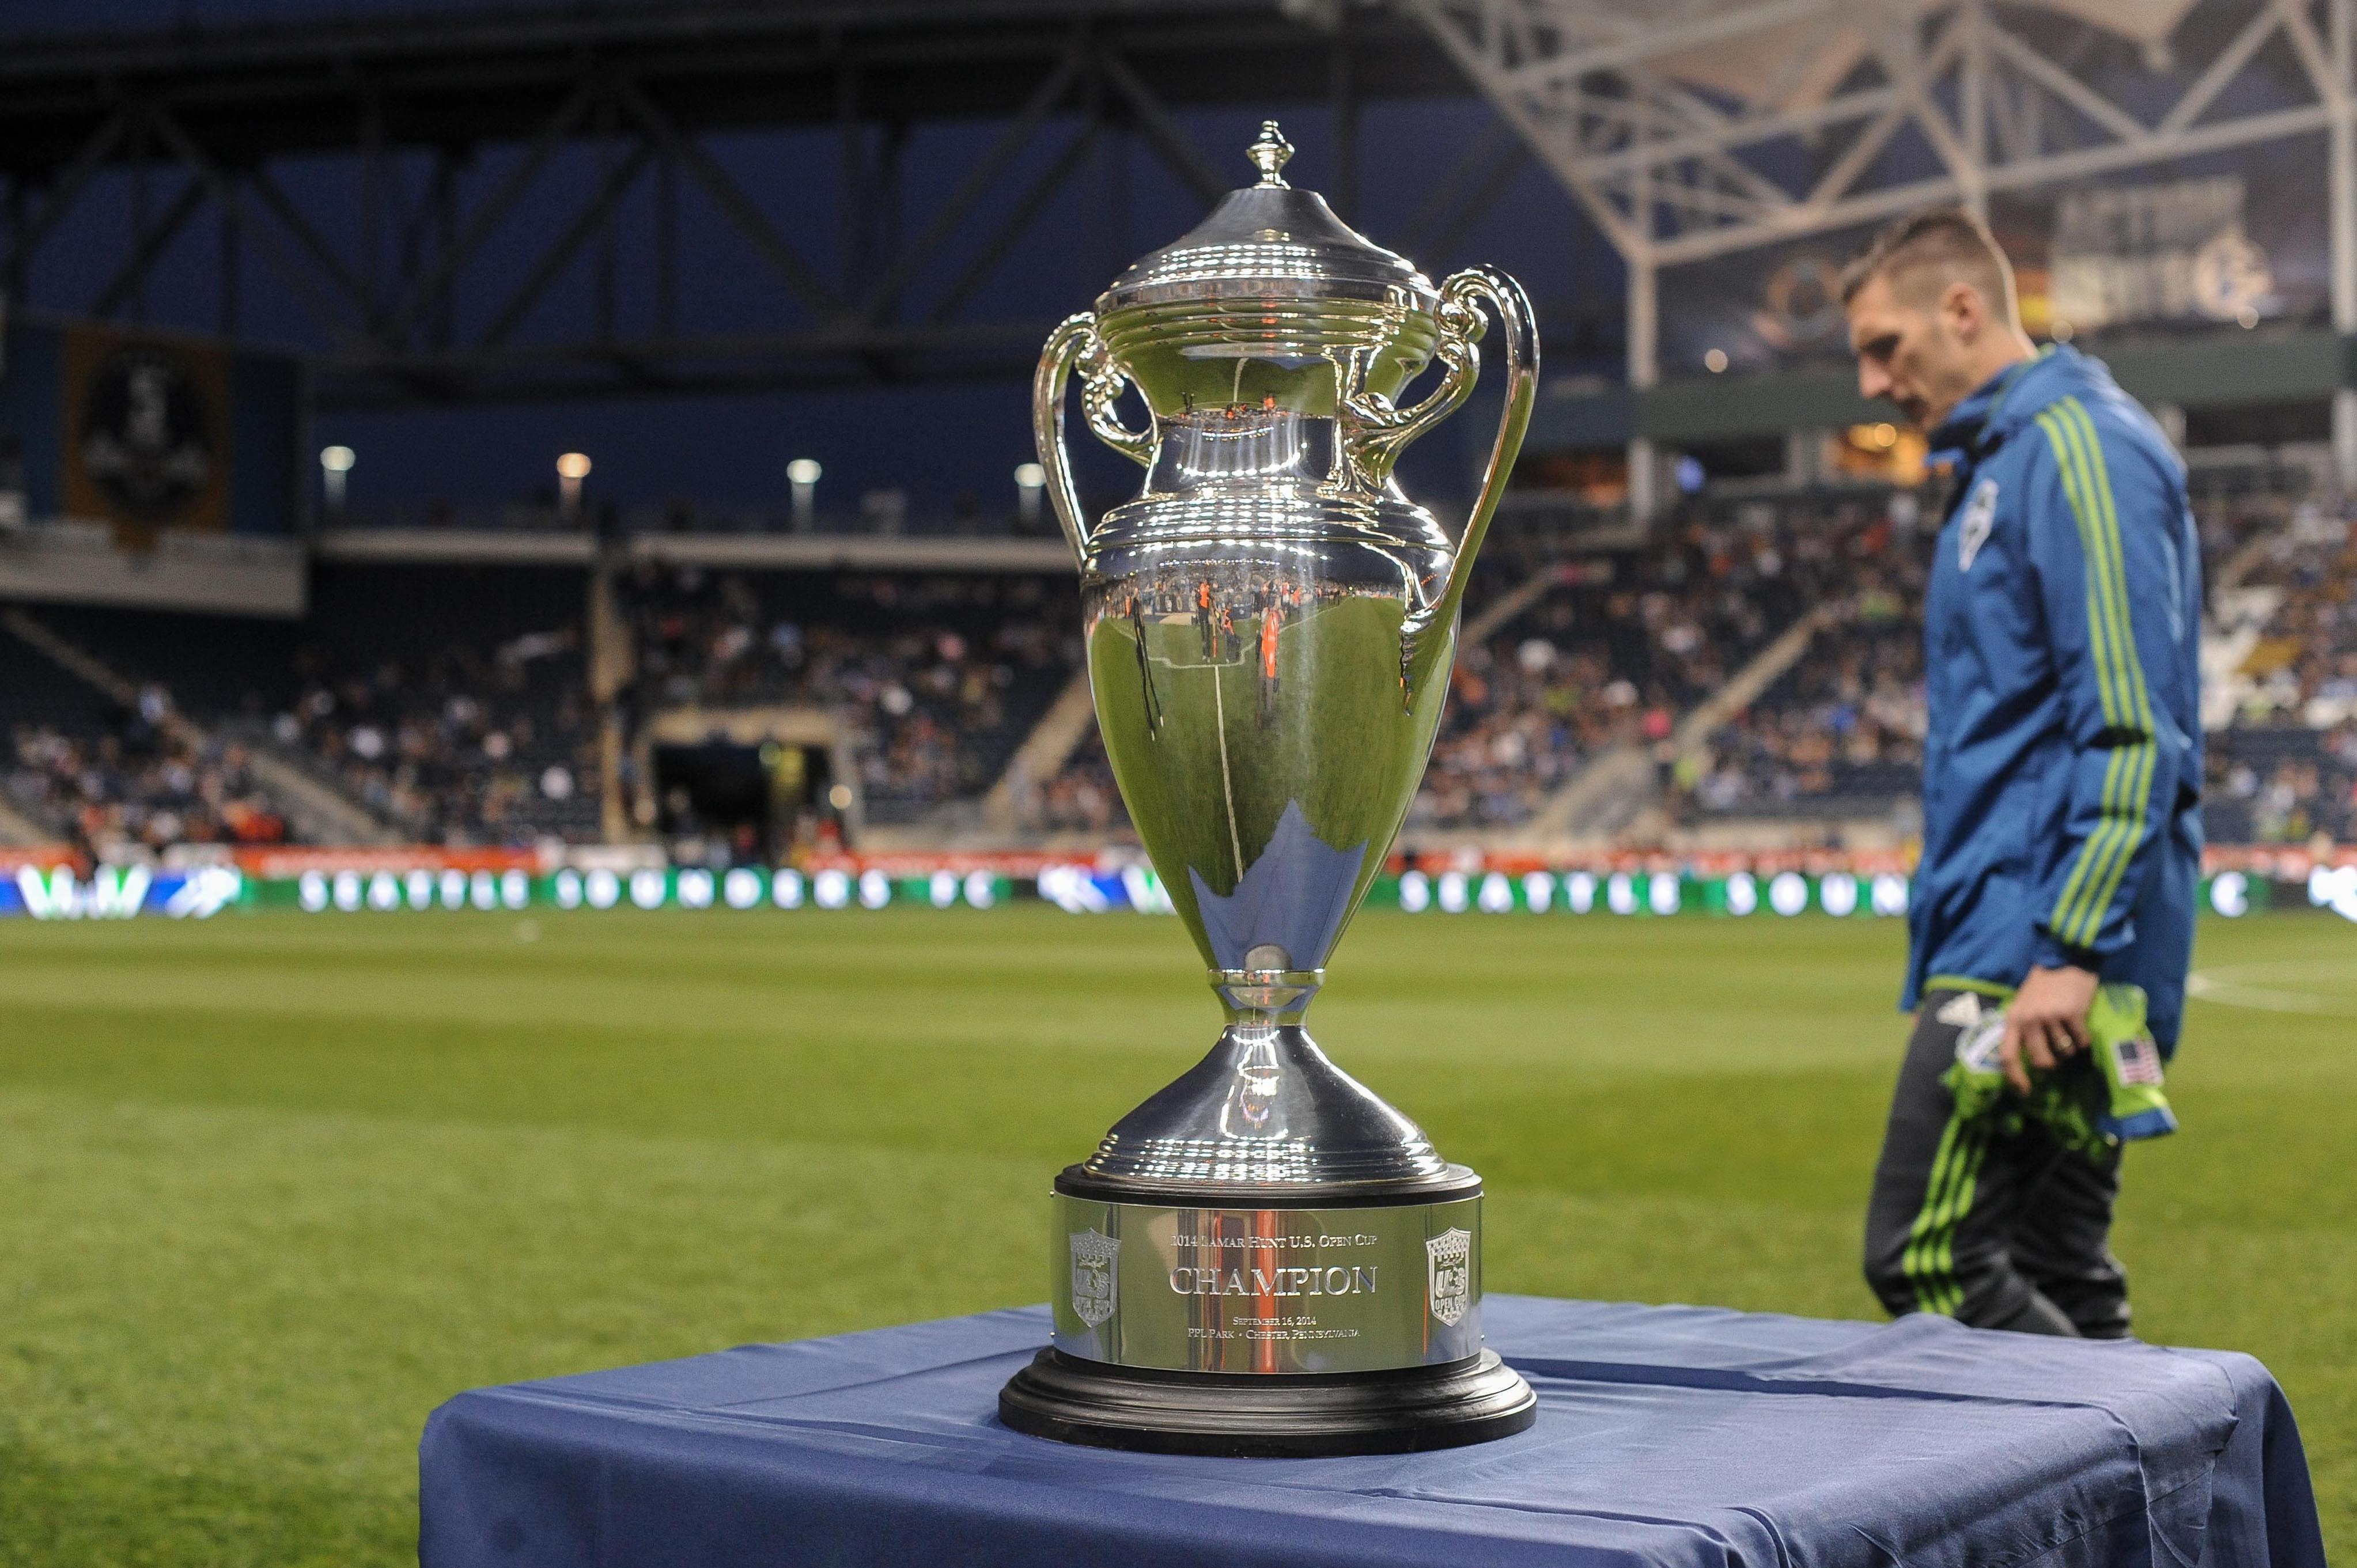 The U.S. Open Cup trophy in 2014.